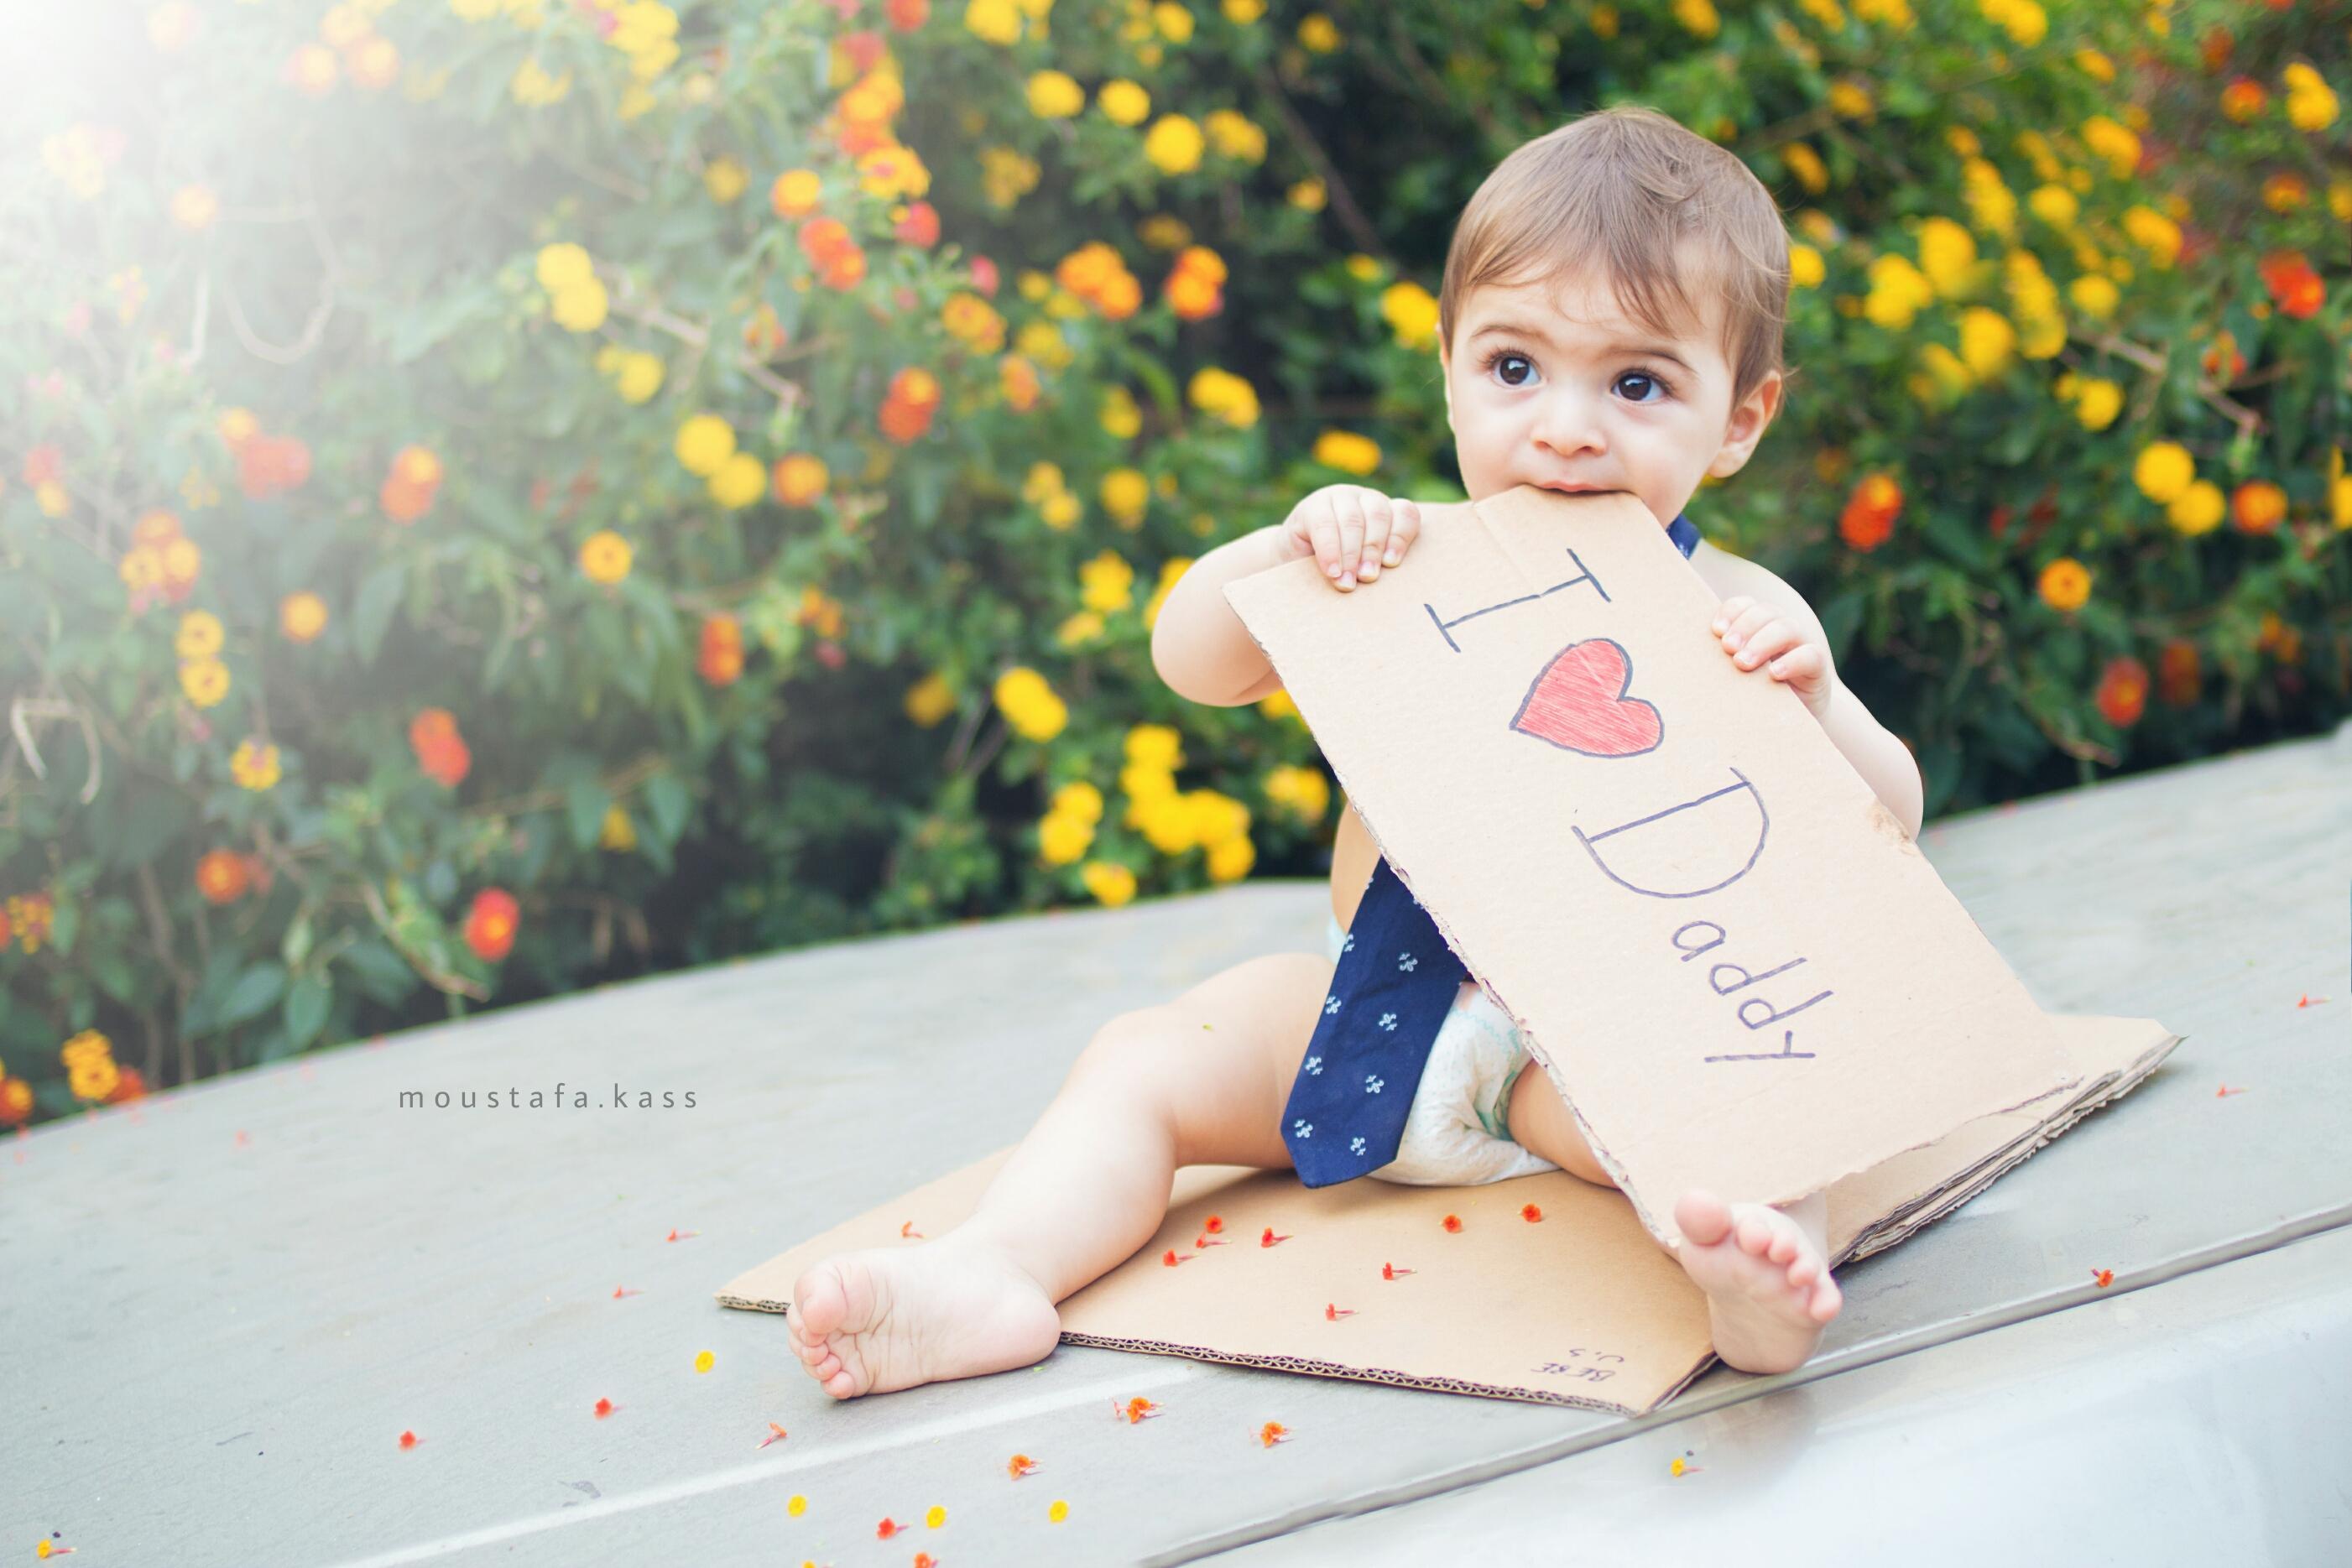 #happyfathersday #kids #cute #fathersday